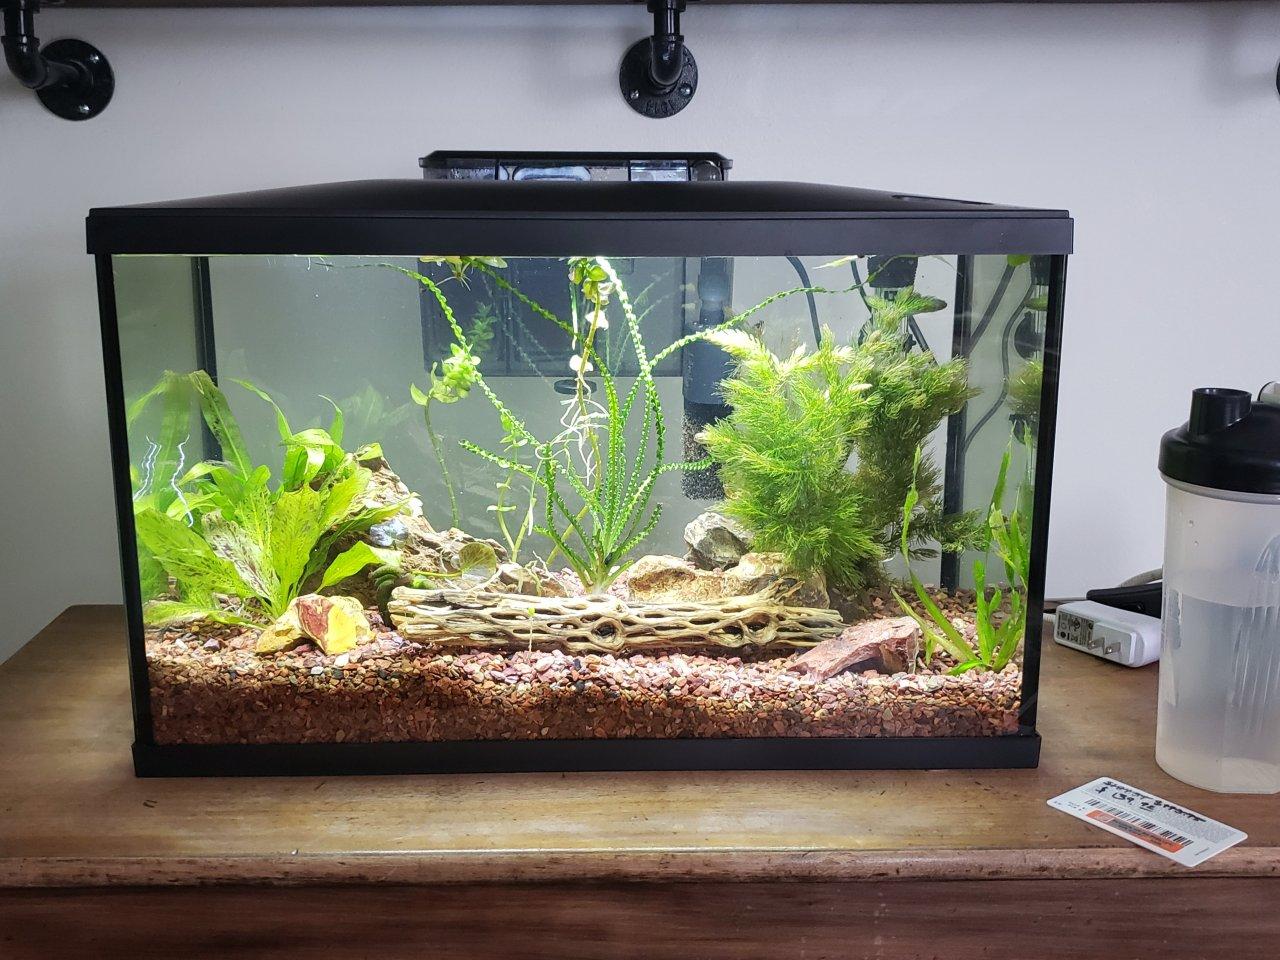 10 Gallon Tank Ideas My Aquarium Club